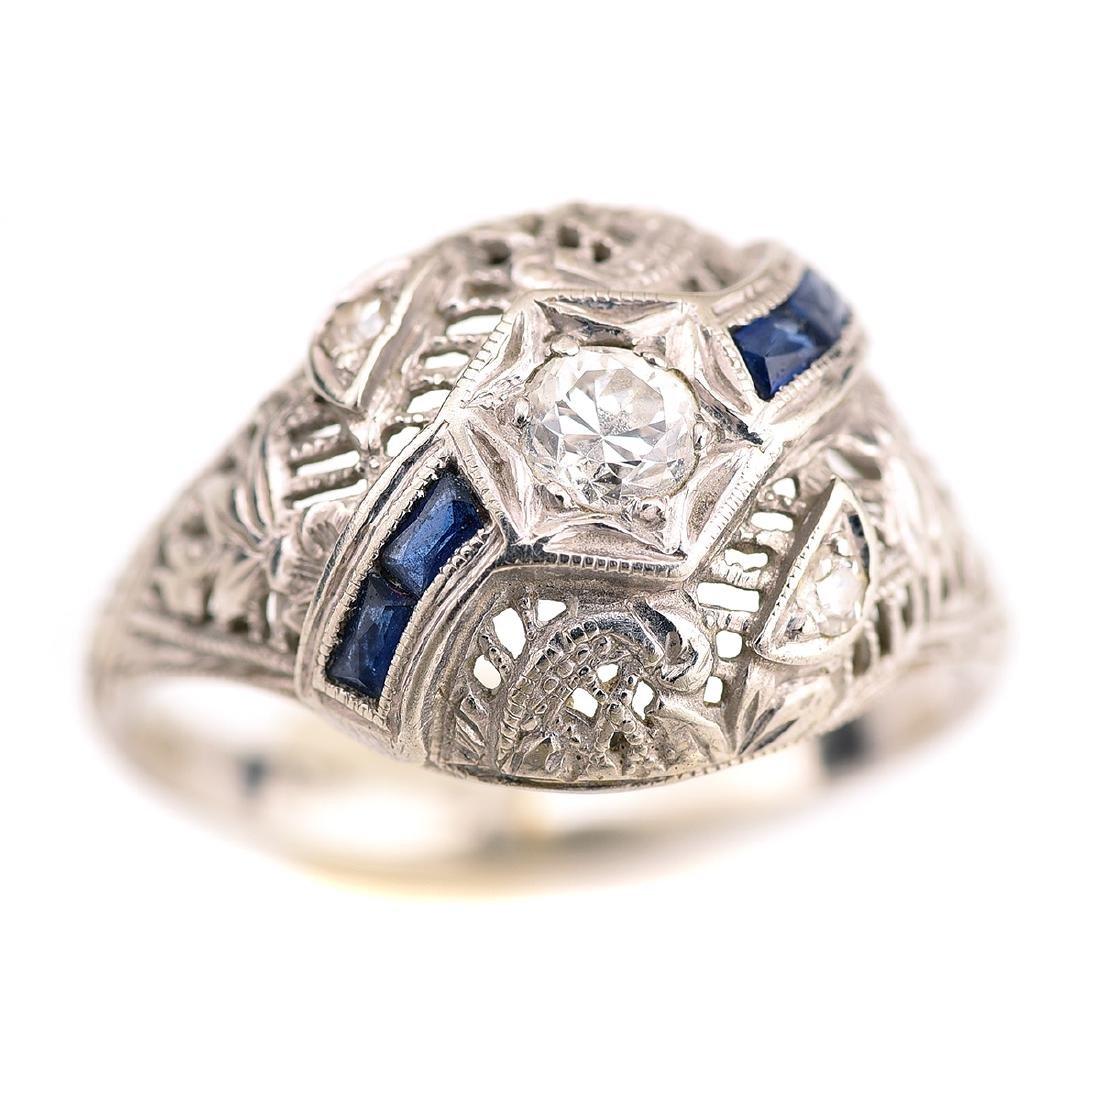 Vintage Diamond, Sapphire, 18k White Gold Ring.